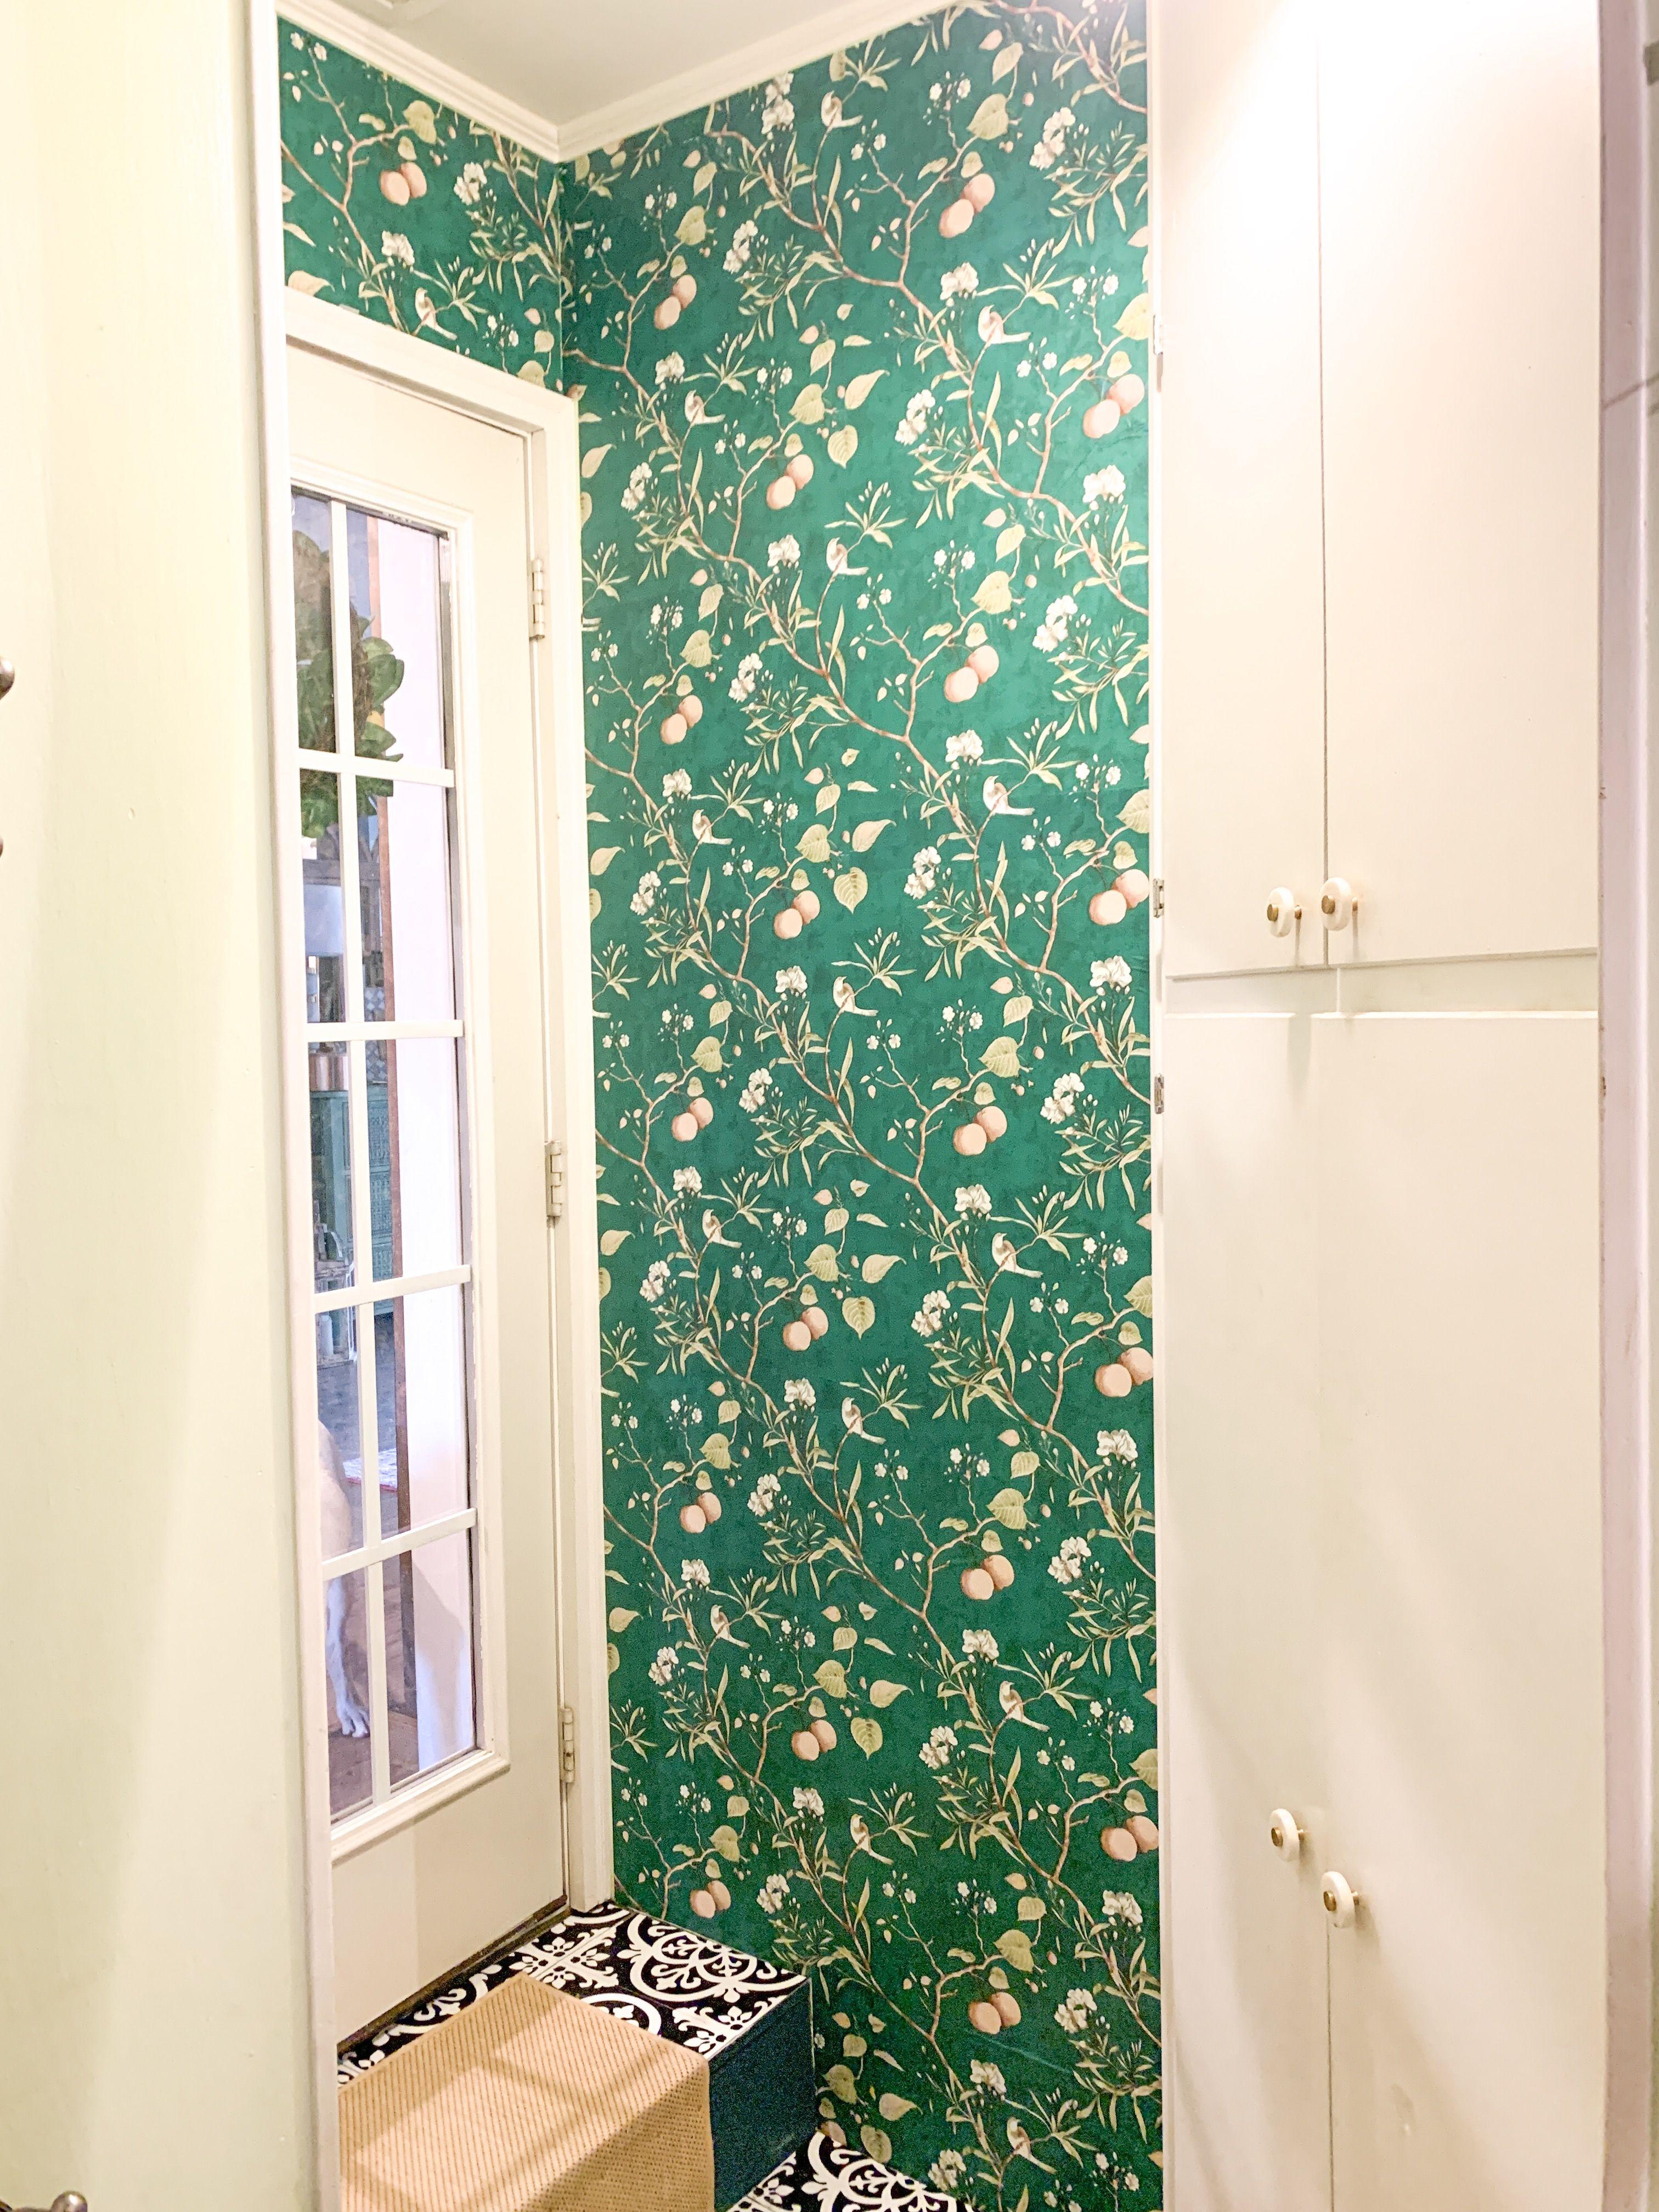 Peel Stick Wallpaper Tree Removable Wallpaper Peel And Stick Wallpaper Modern Wallpaper